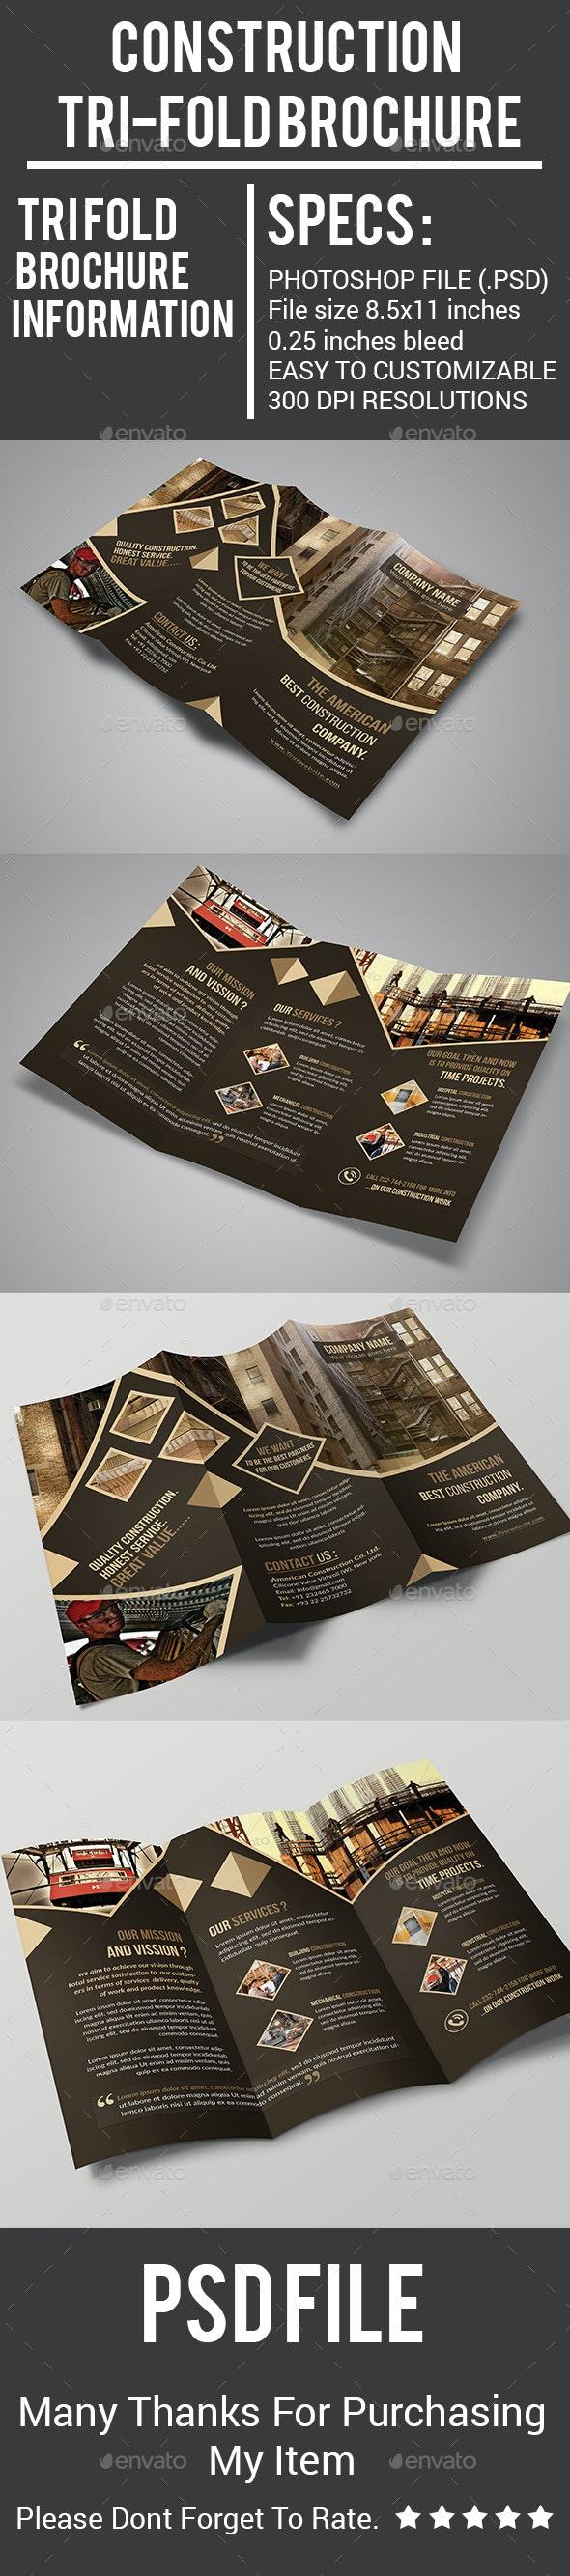 Construction Tri-Fold Brochure - Corporate Brochures